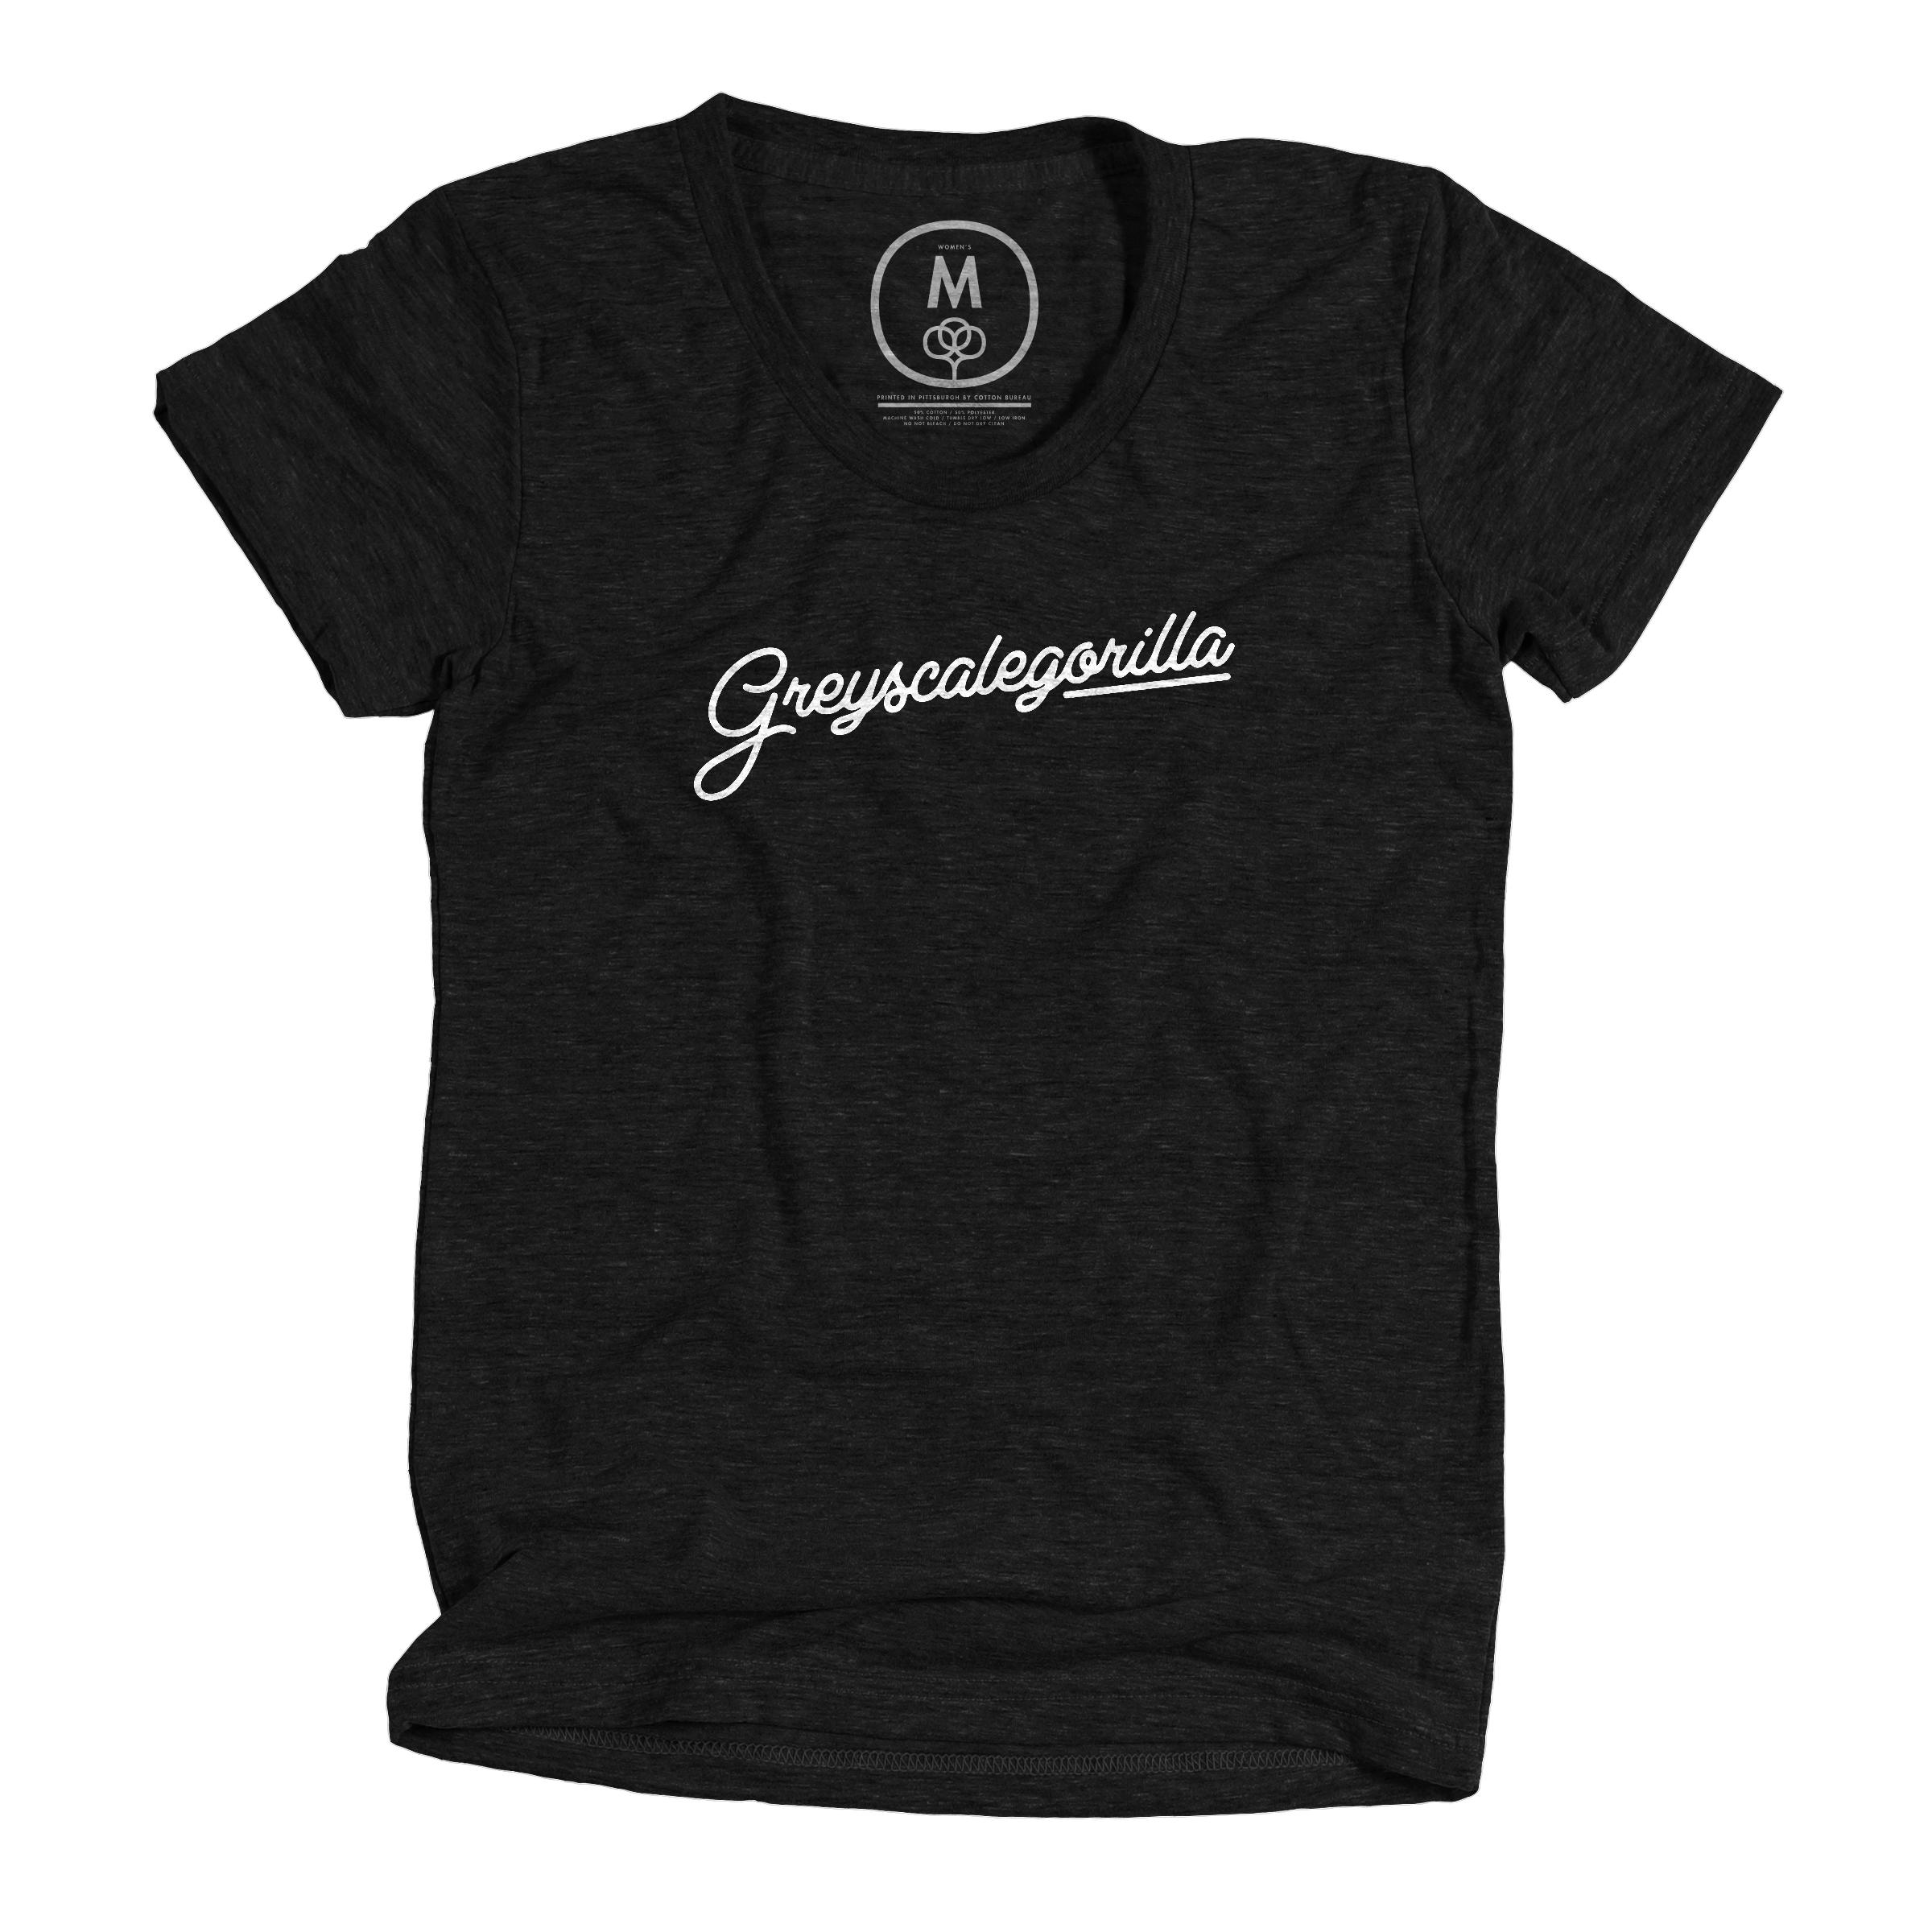 Greyscalegorilla Script Limited Edition Vintage Black (Women's)